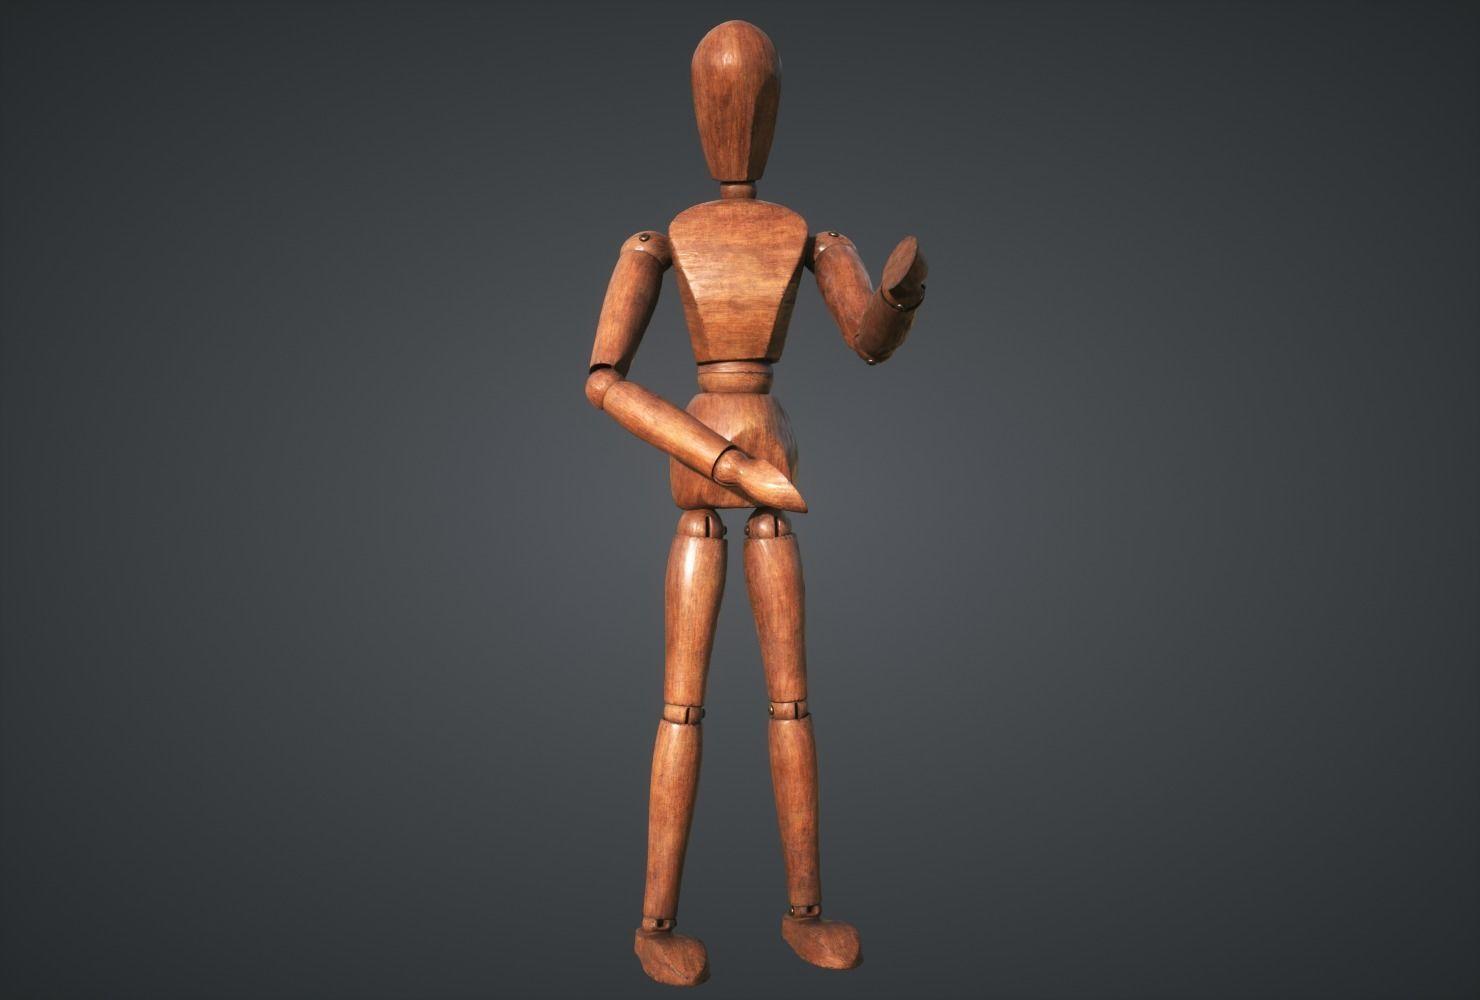 Mannequin wooden